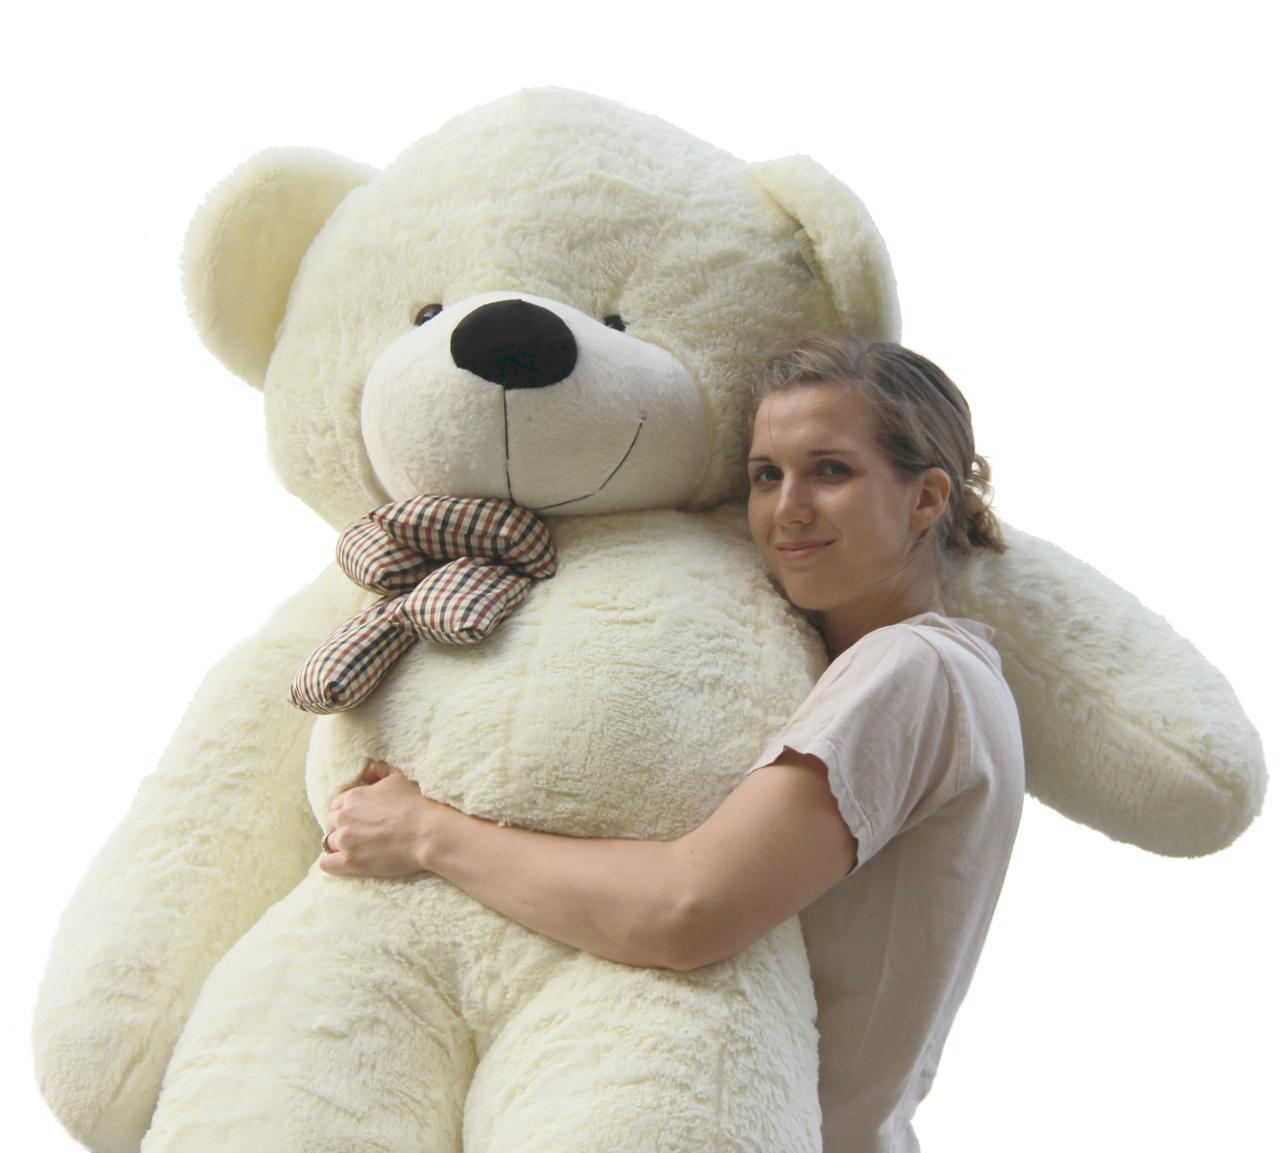 TOP SALE 78/'/' Huge Giant Big Teddy Bear Plush Soft Toys Life Size Stuffed Animal